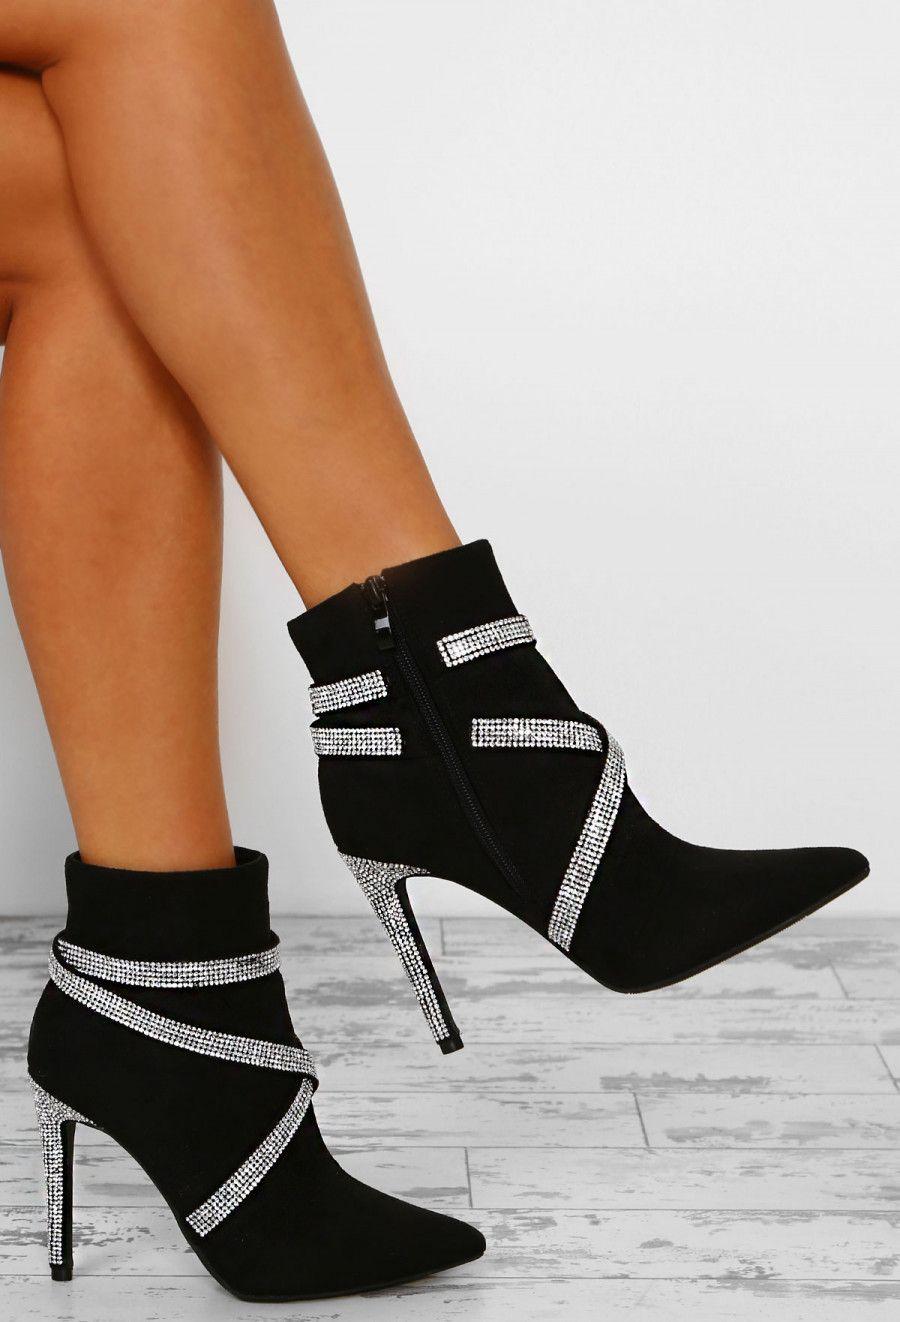 So Soho Black Diamante Embellished Heel